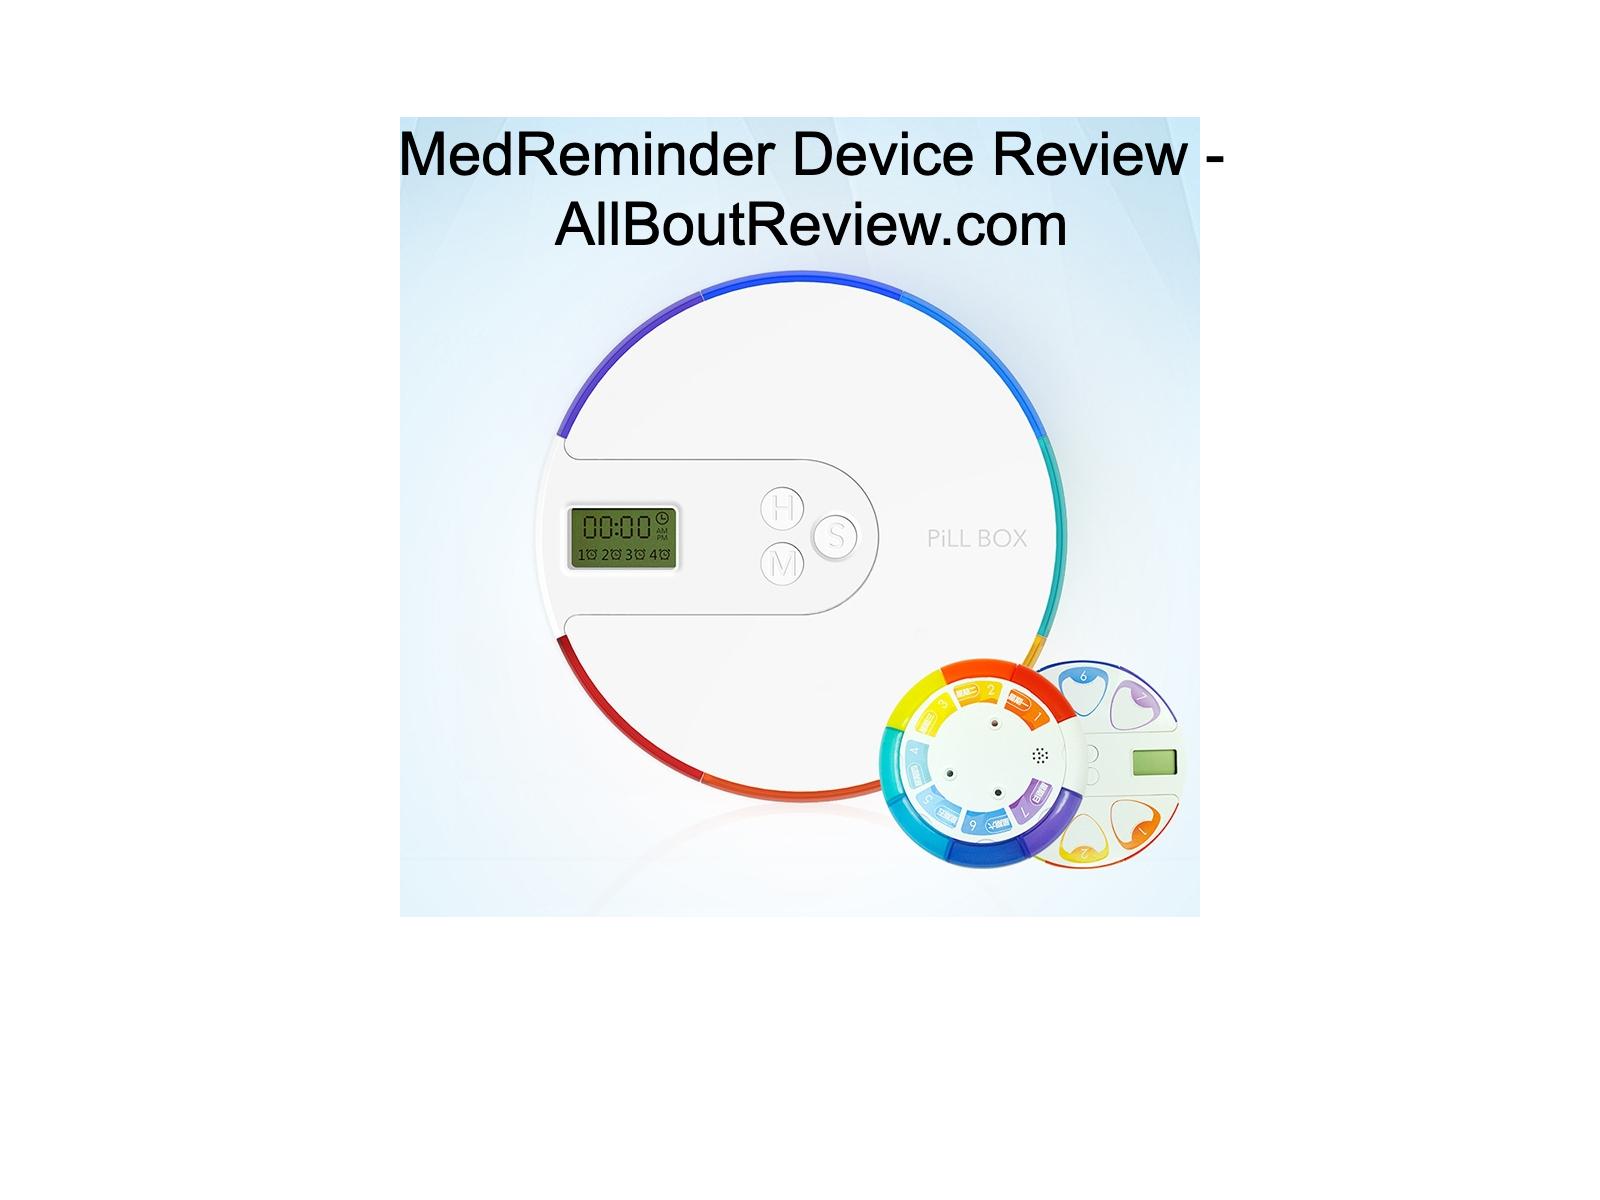 MedReminder Device Review